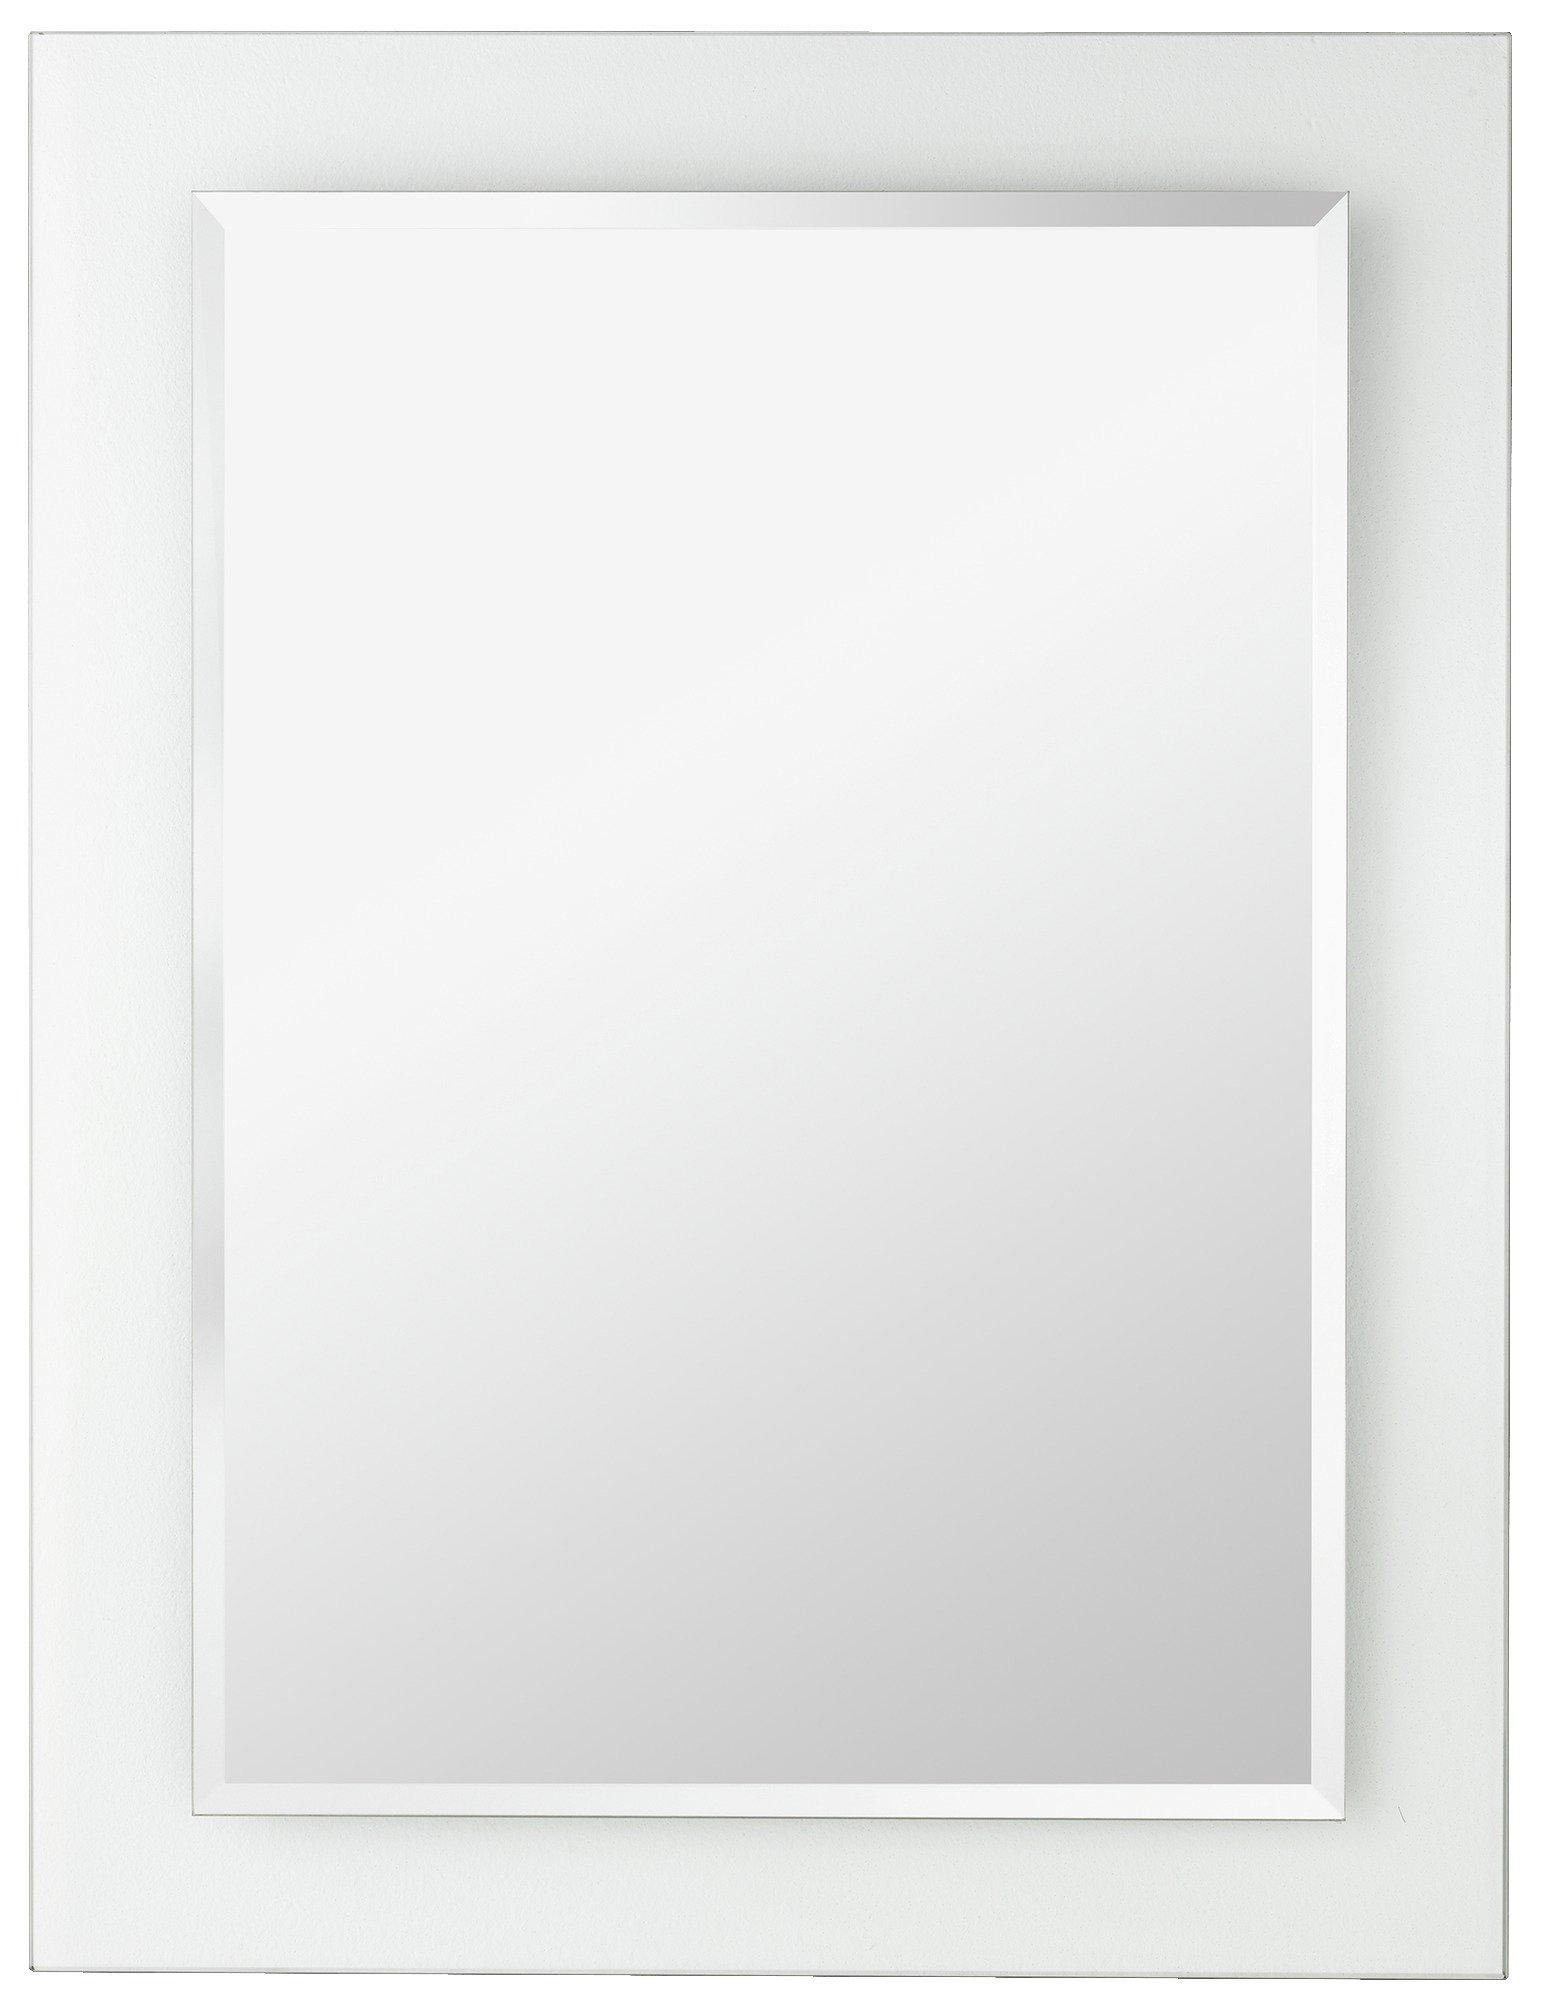 bathroom mirror. home rectangular clear border bathroom mirror